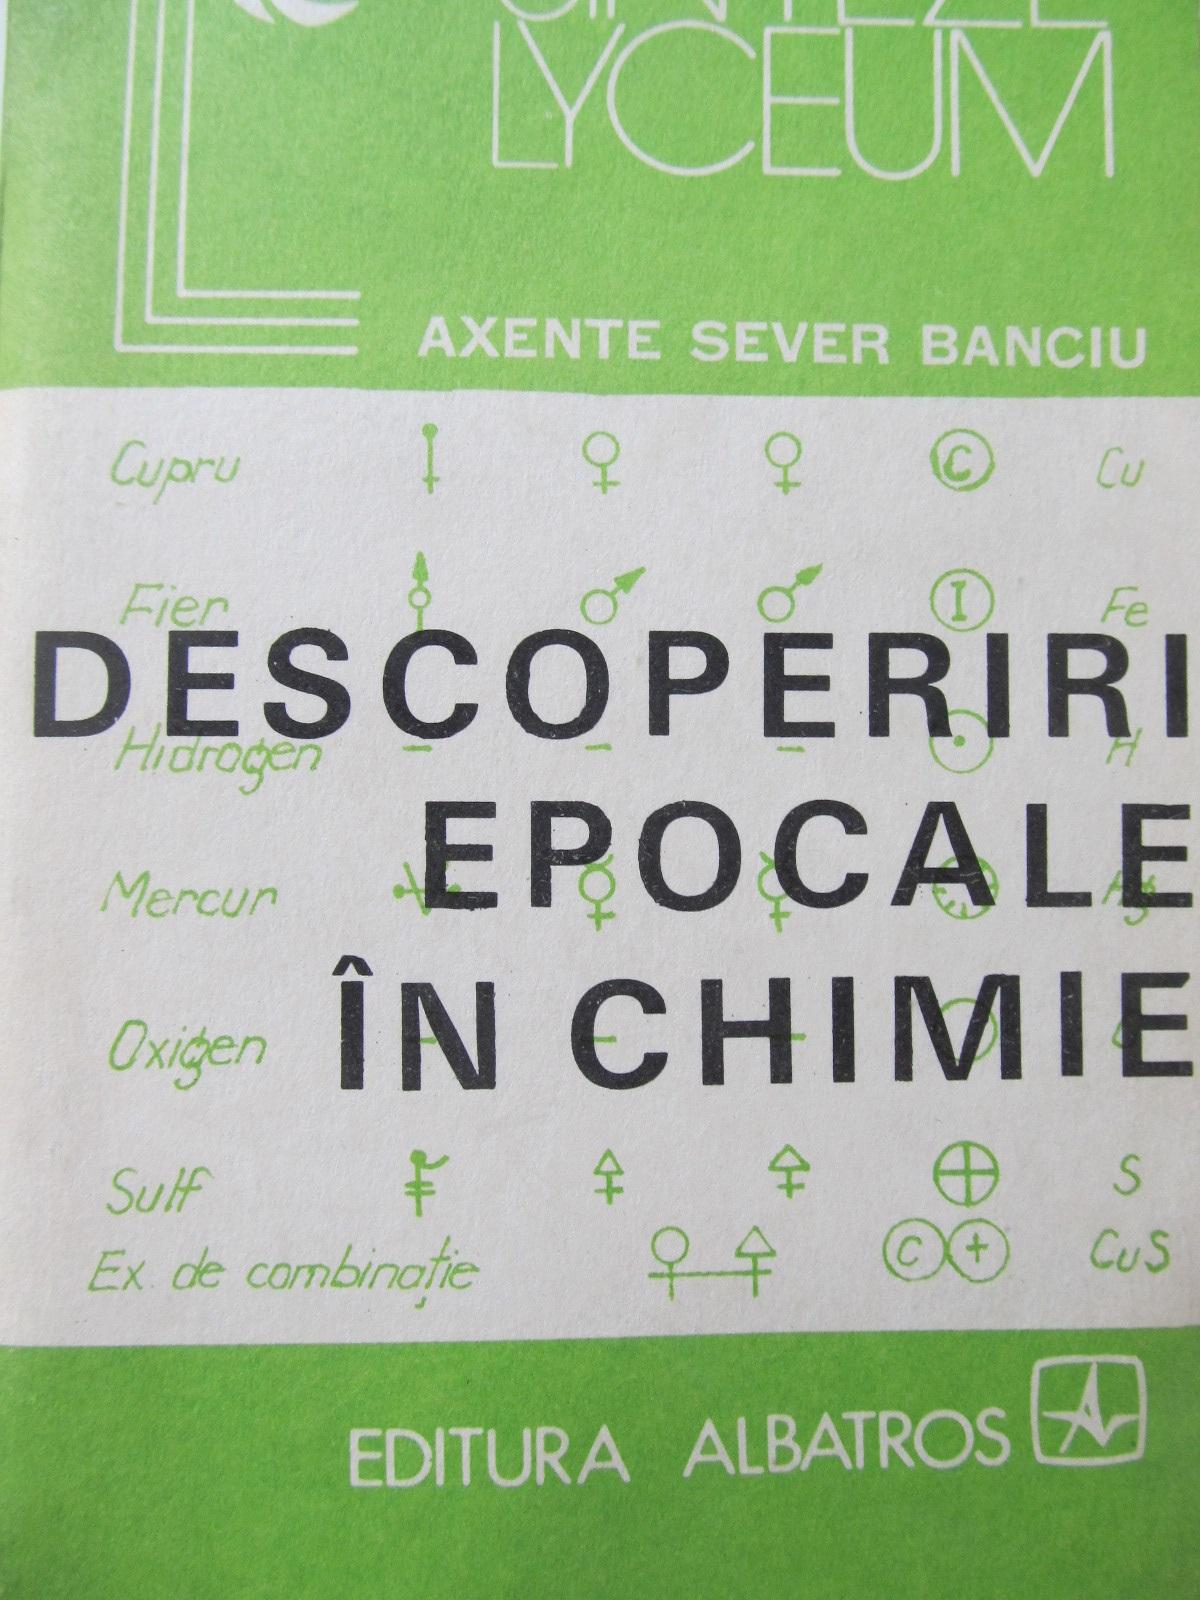 Descoperiri epocale in chimie - Axente Sever Banciu | Detalii carte